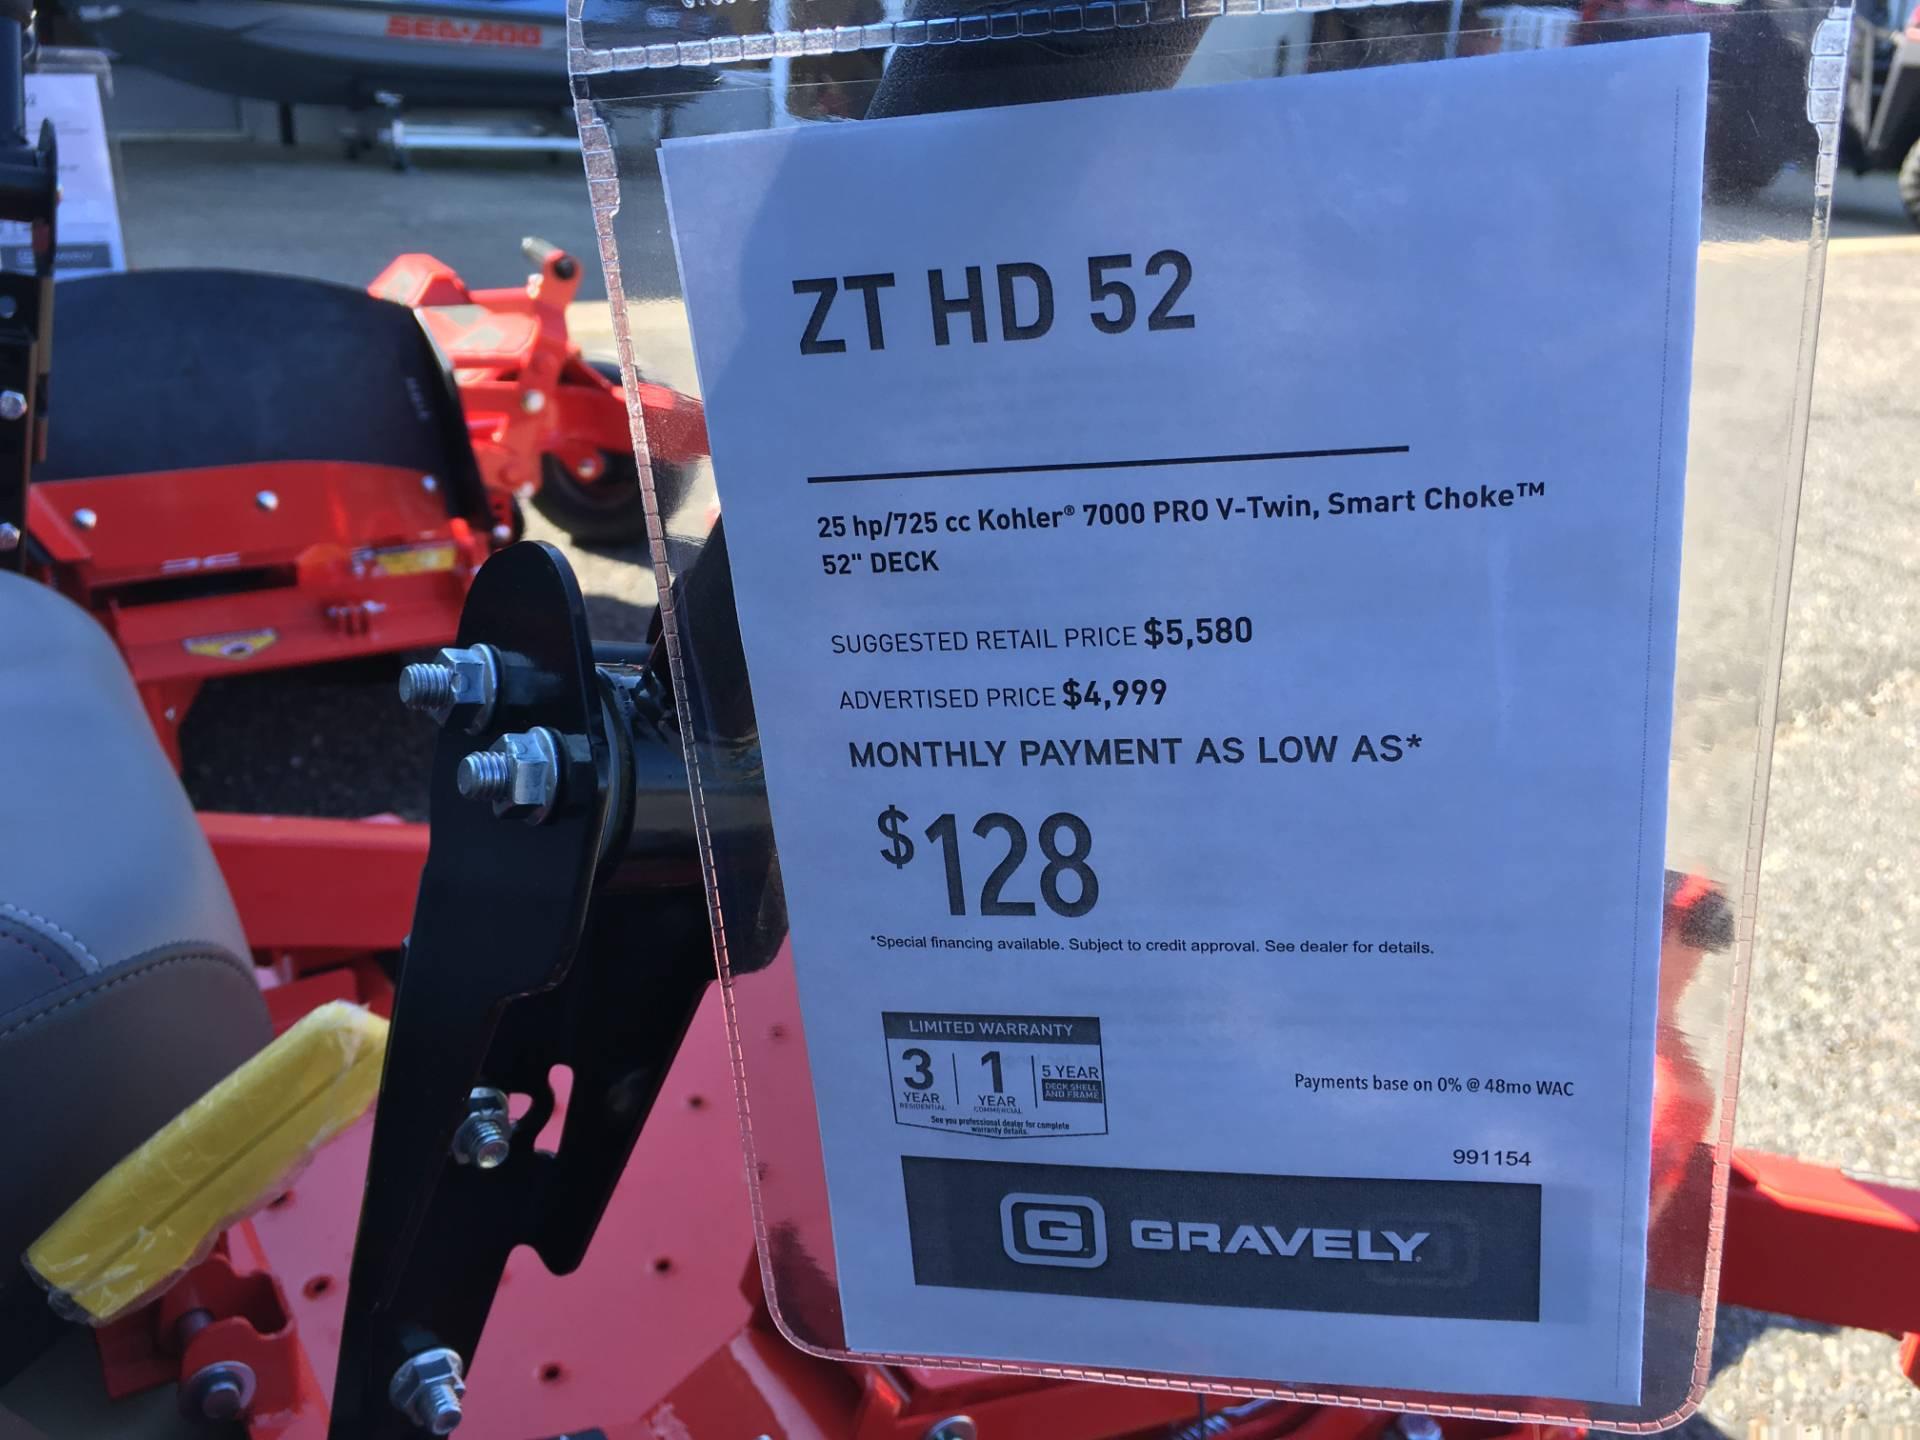 New 2018 Gravely USA ZT HD 52 (Kohler) Lawn Mowers in Saucier, MS ...